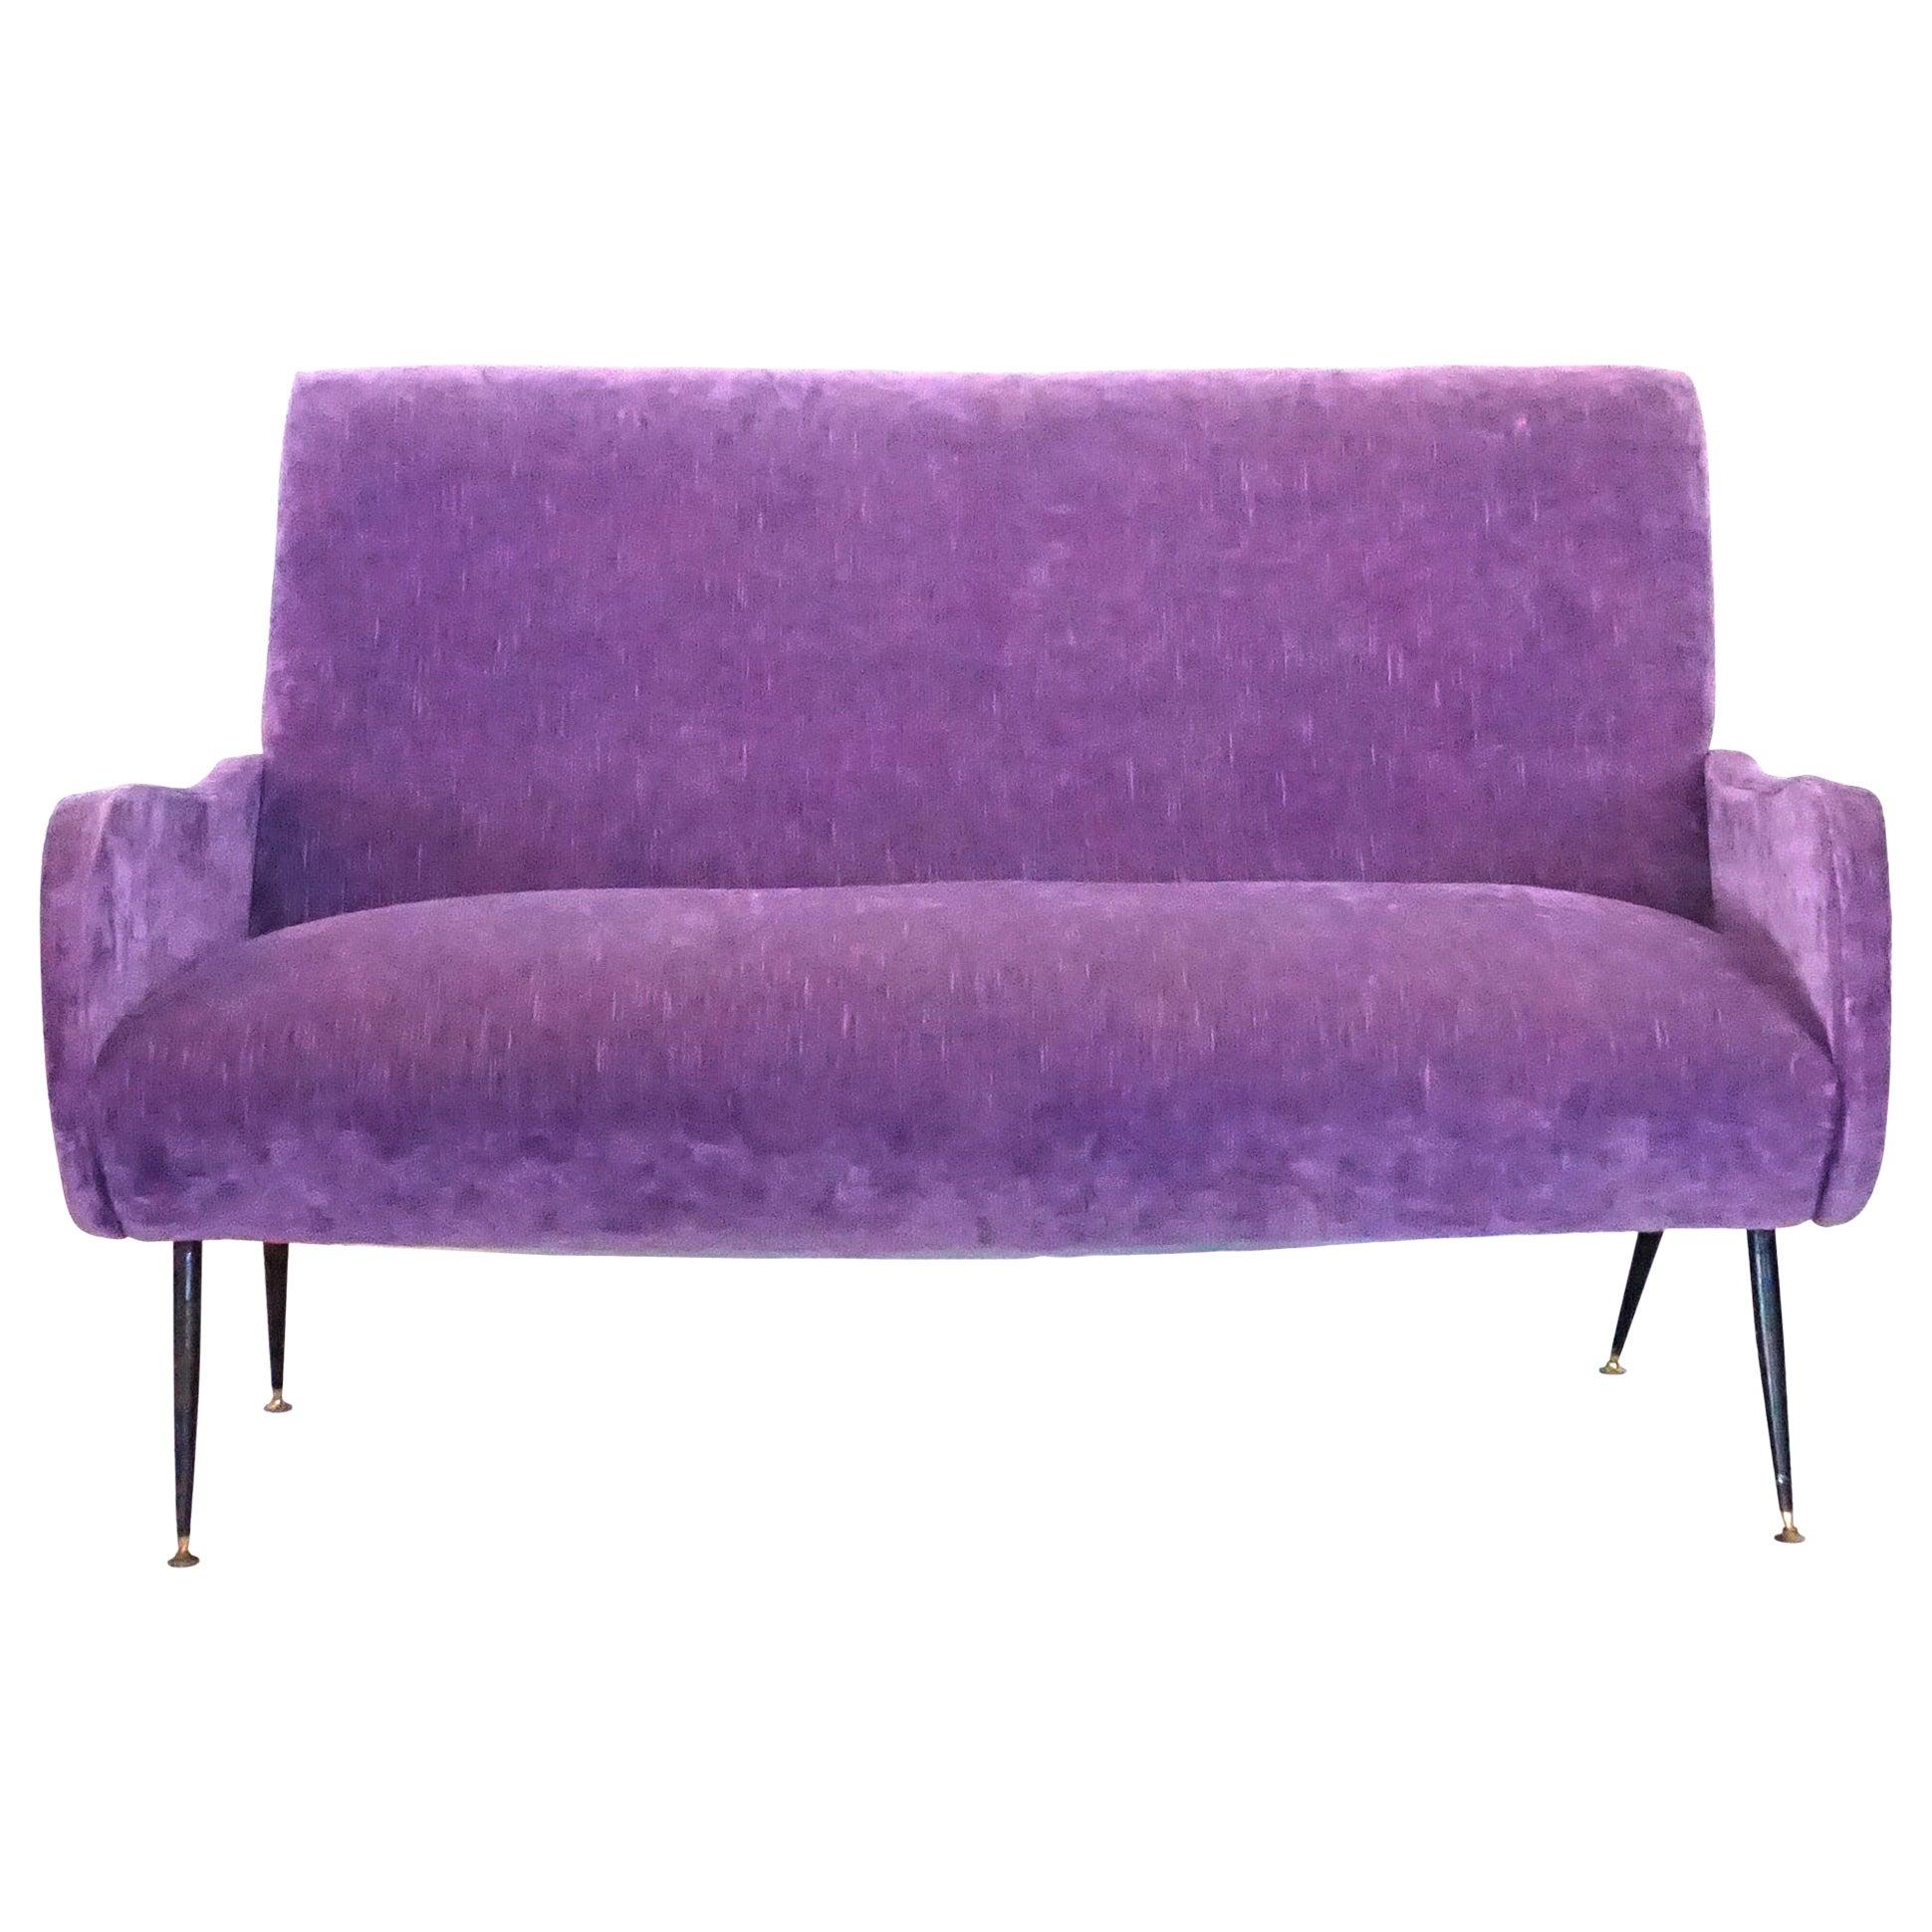 20th Century Lila Italian Small Two-Seat Sofa by Marco Zanuso